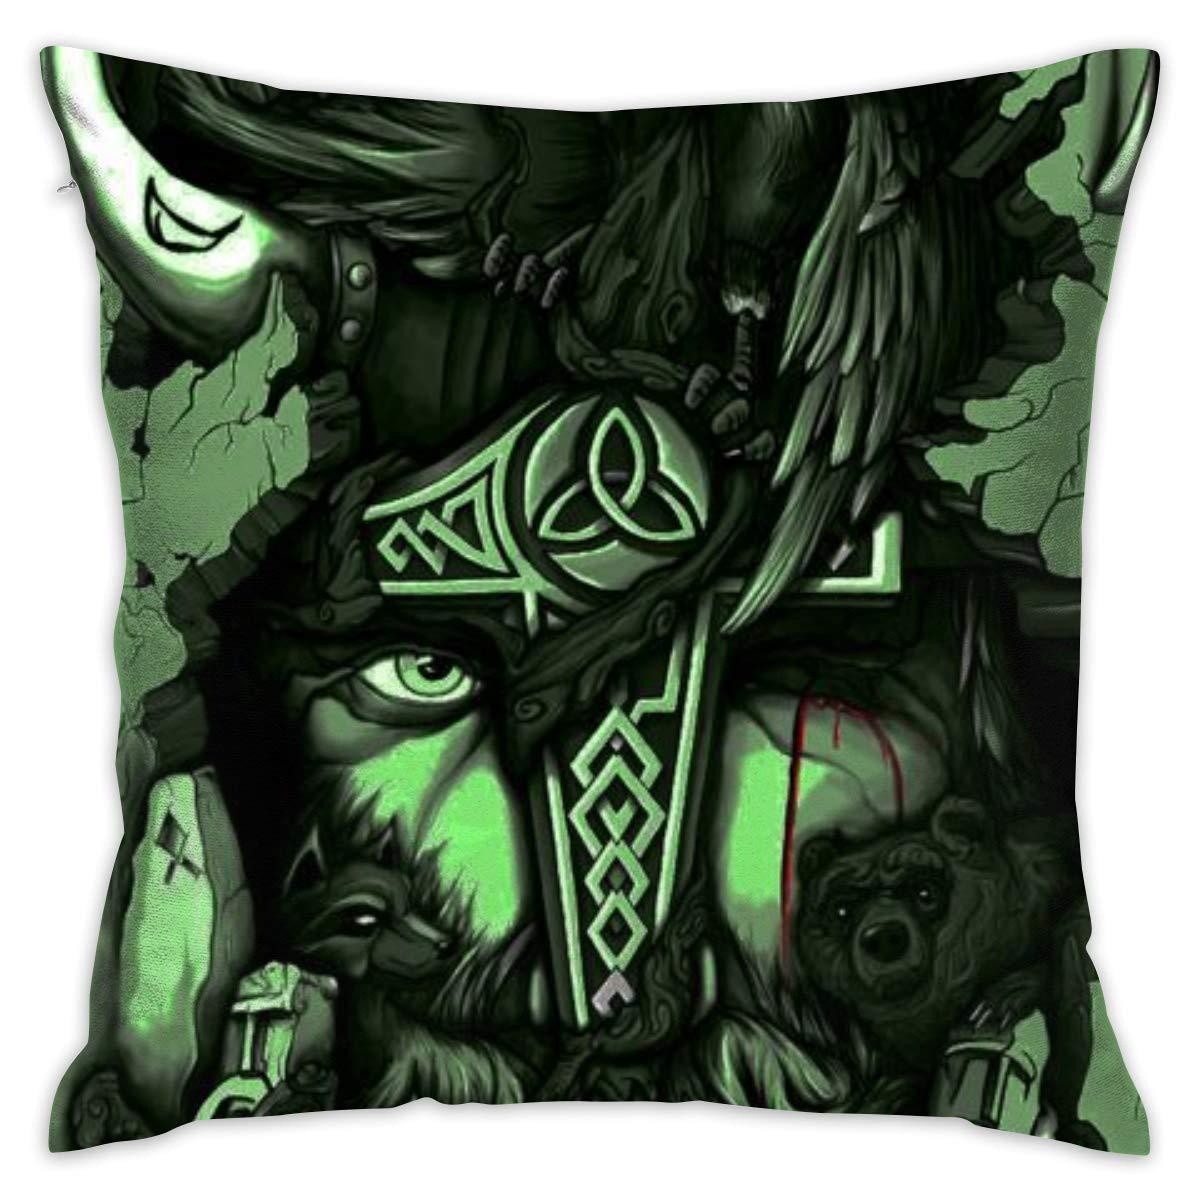 Yoda throw pillow, adorable this is